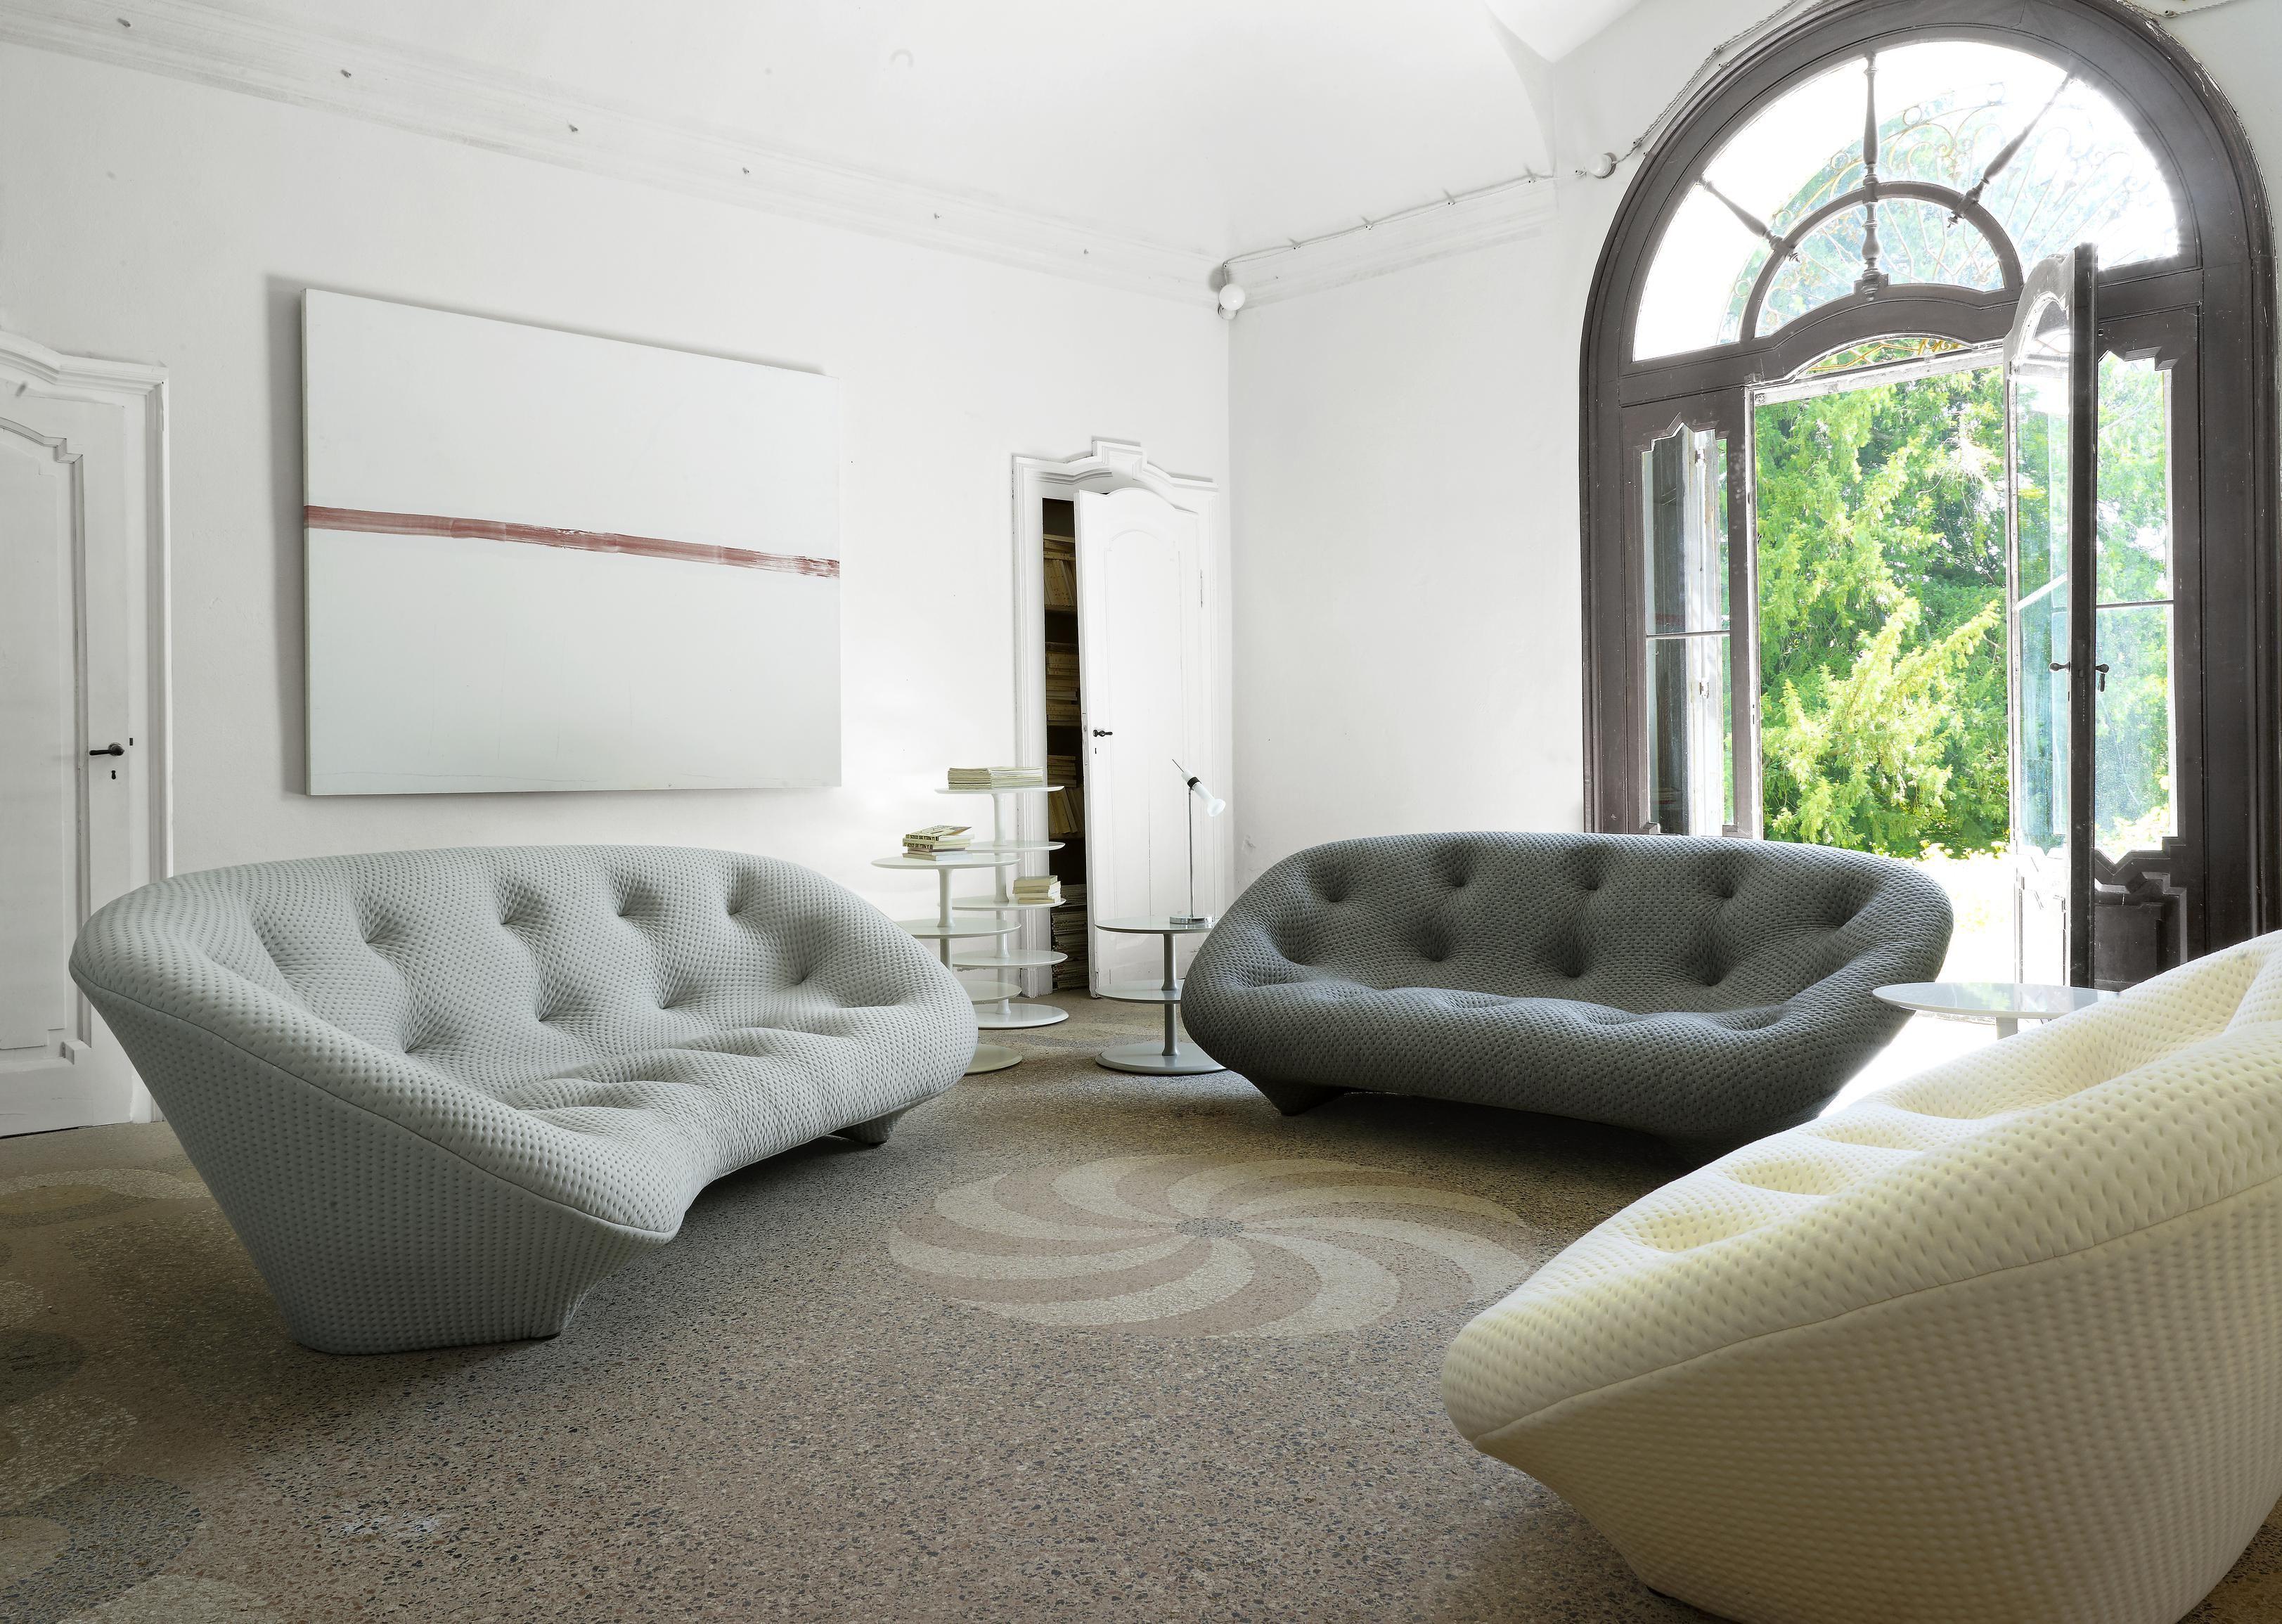 Ploum Sofas Designer  R& Ebouroullec  Ligne Roset  Living Entrancing Living Room Design Planner Design Inspiration